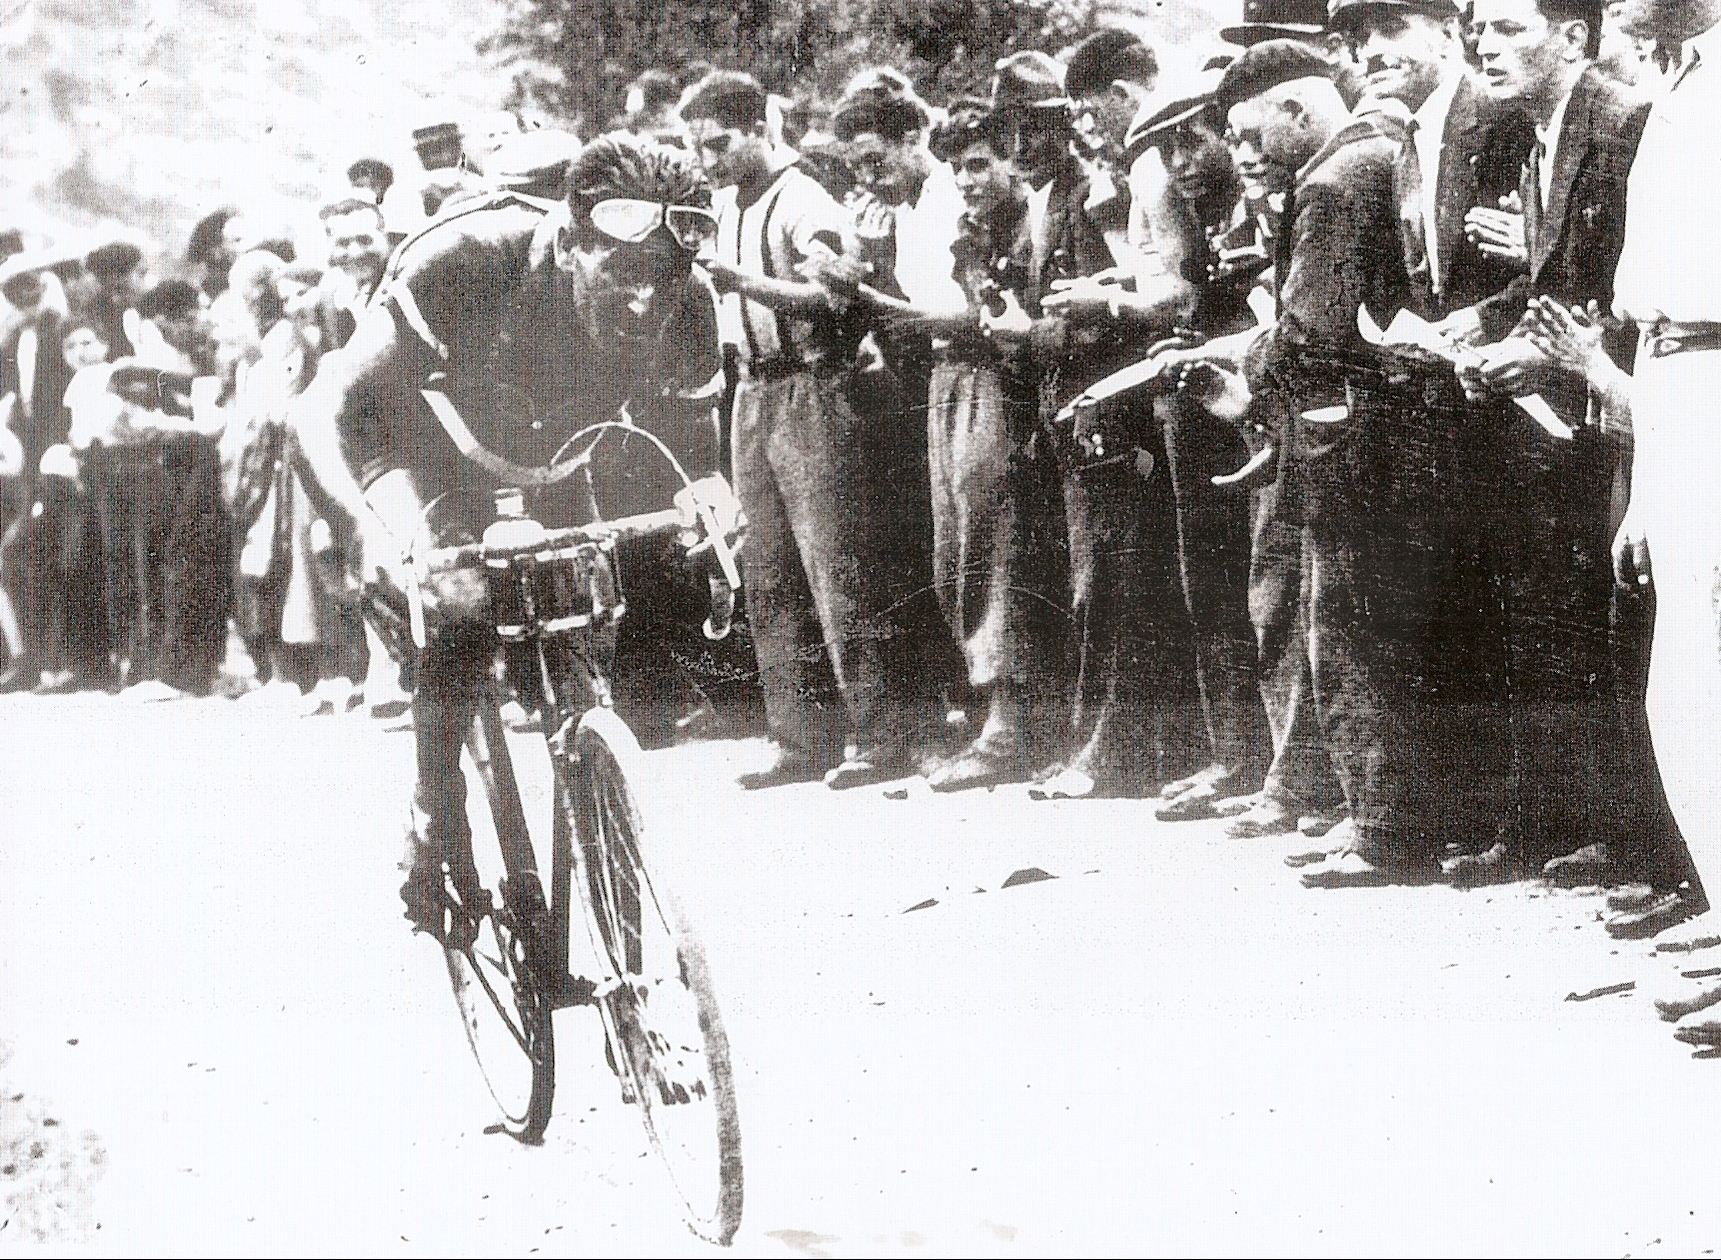 Adriano Vignoli al Tour de France